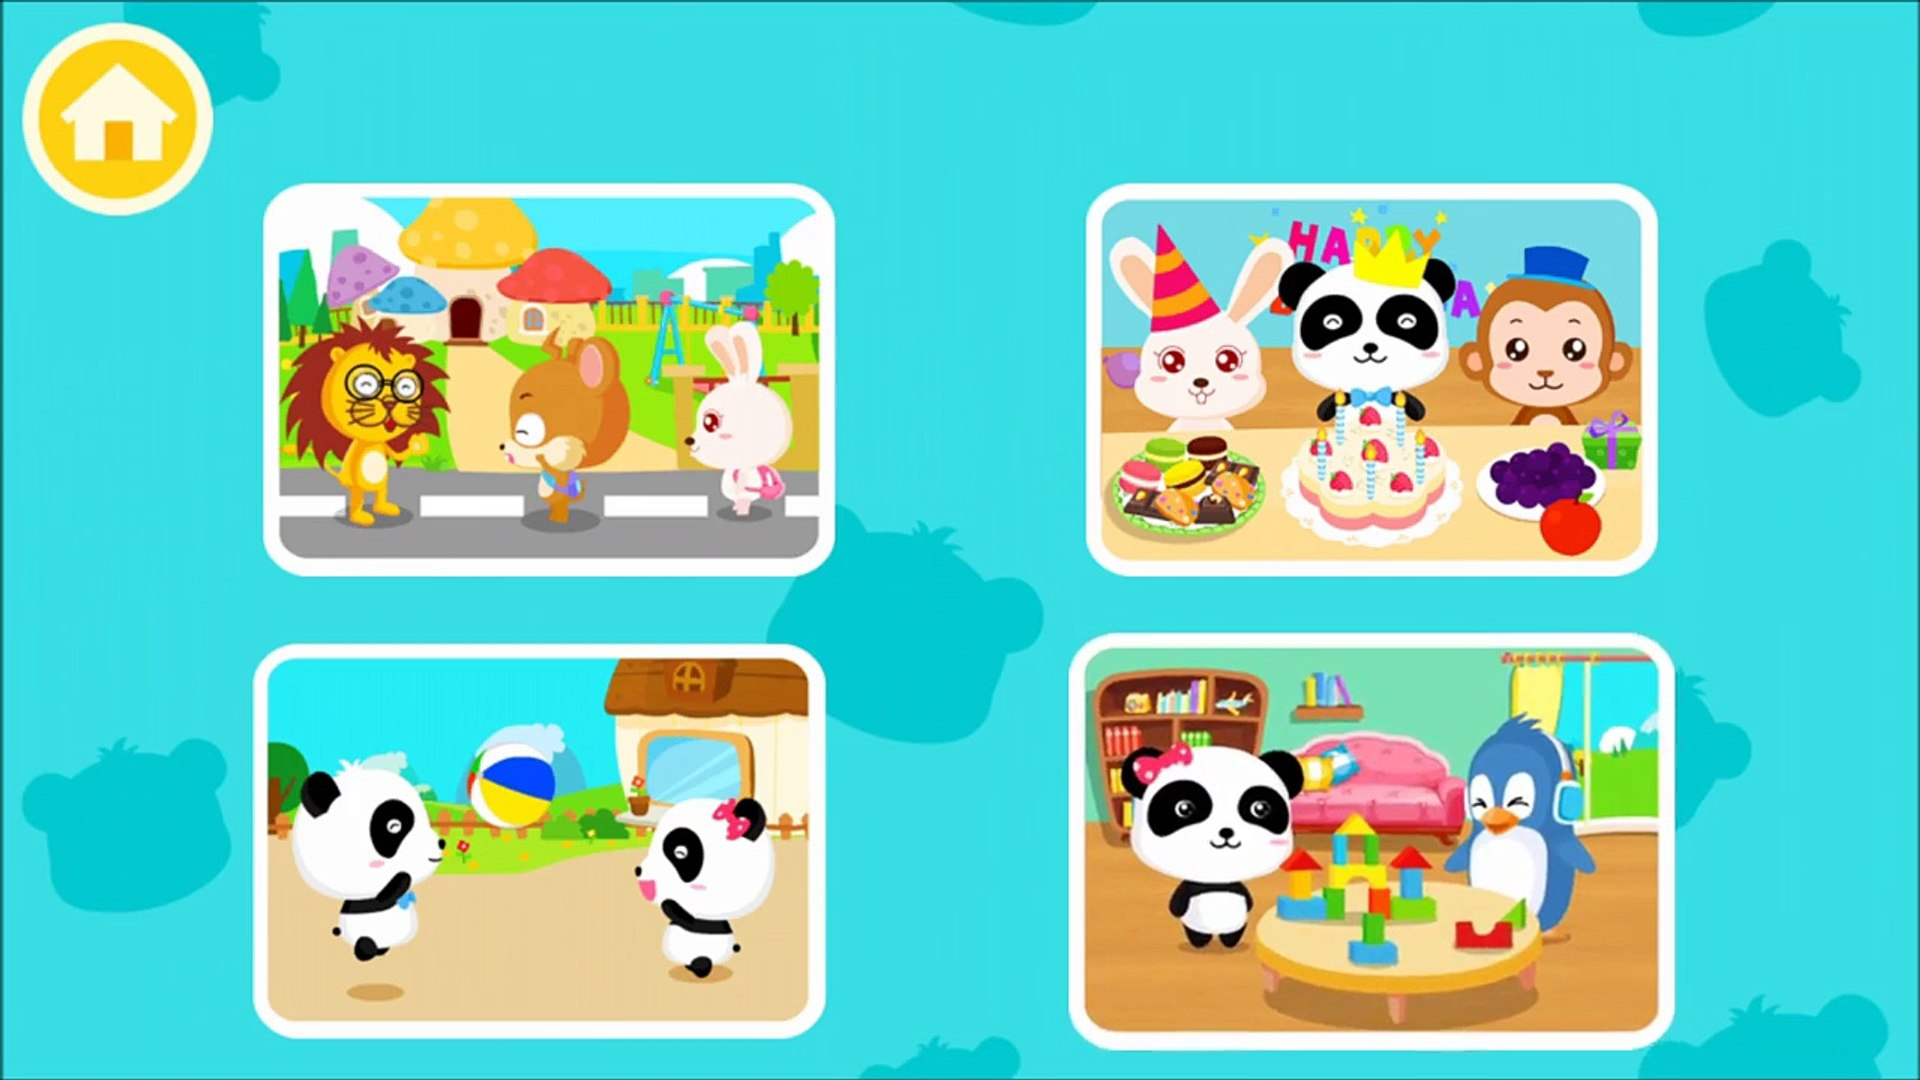 Kids Learn Magic Words To Be Polite - Baby Panda | Babybus Kids Education Games